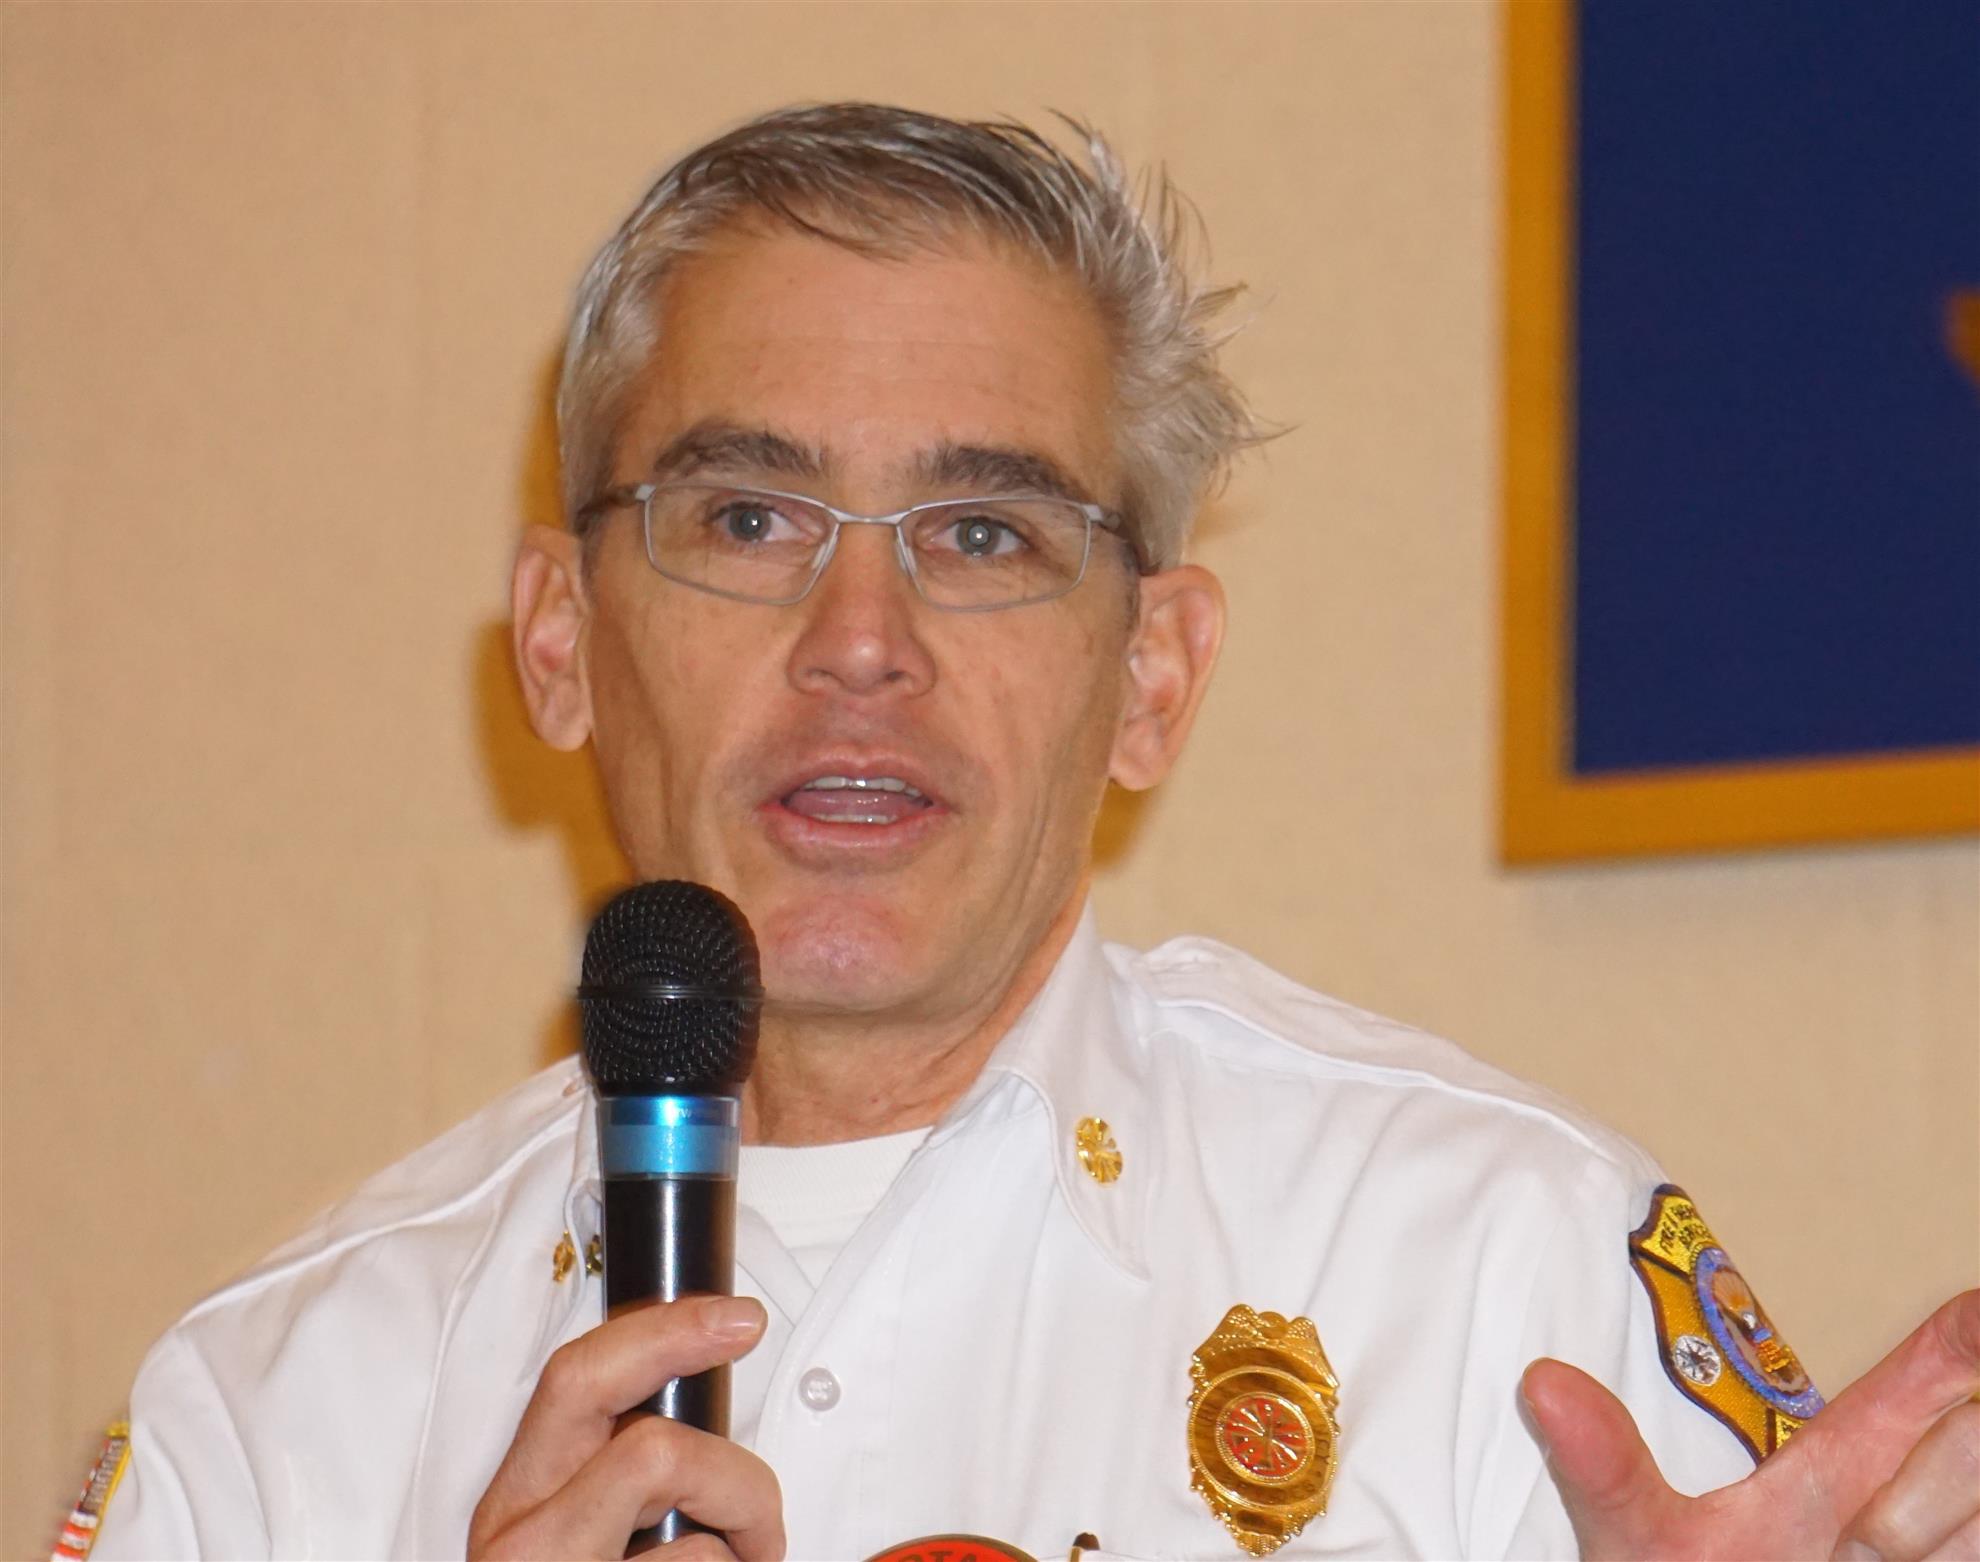 Kurt Waeschle